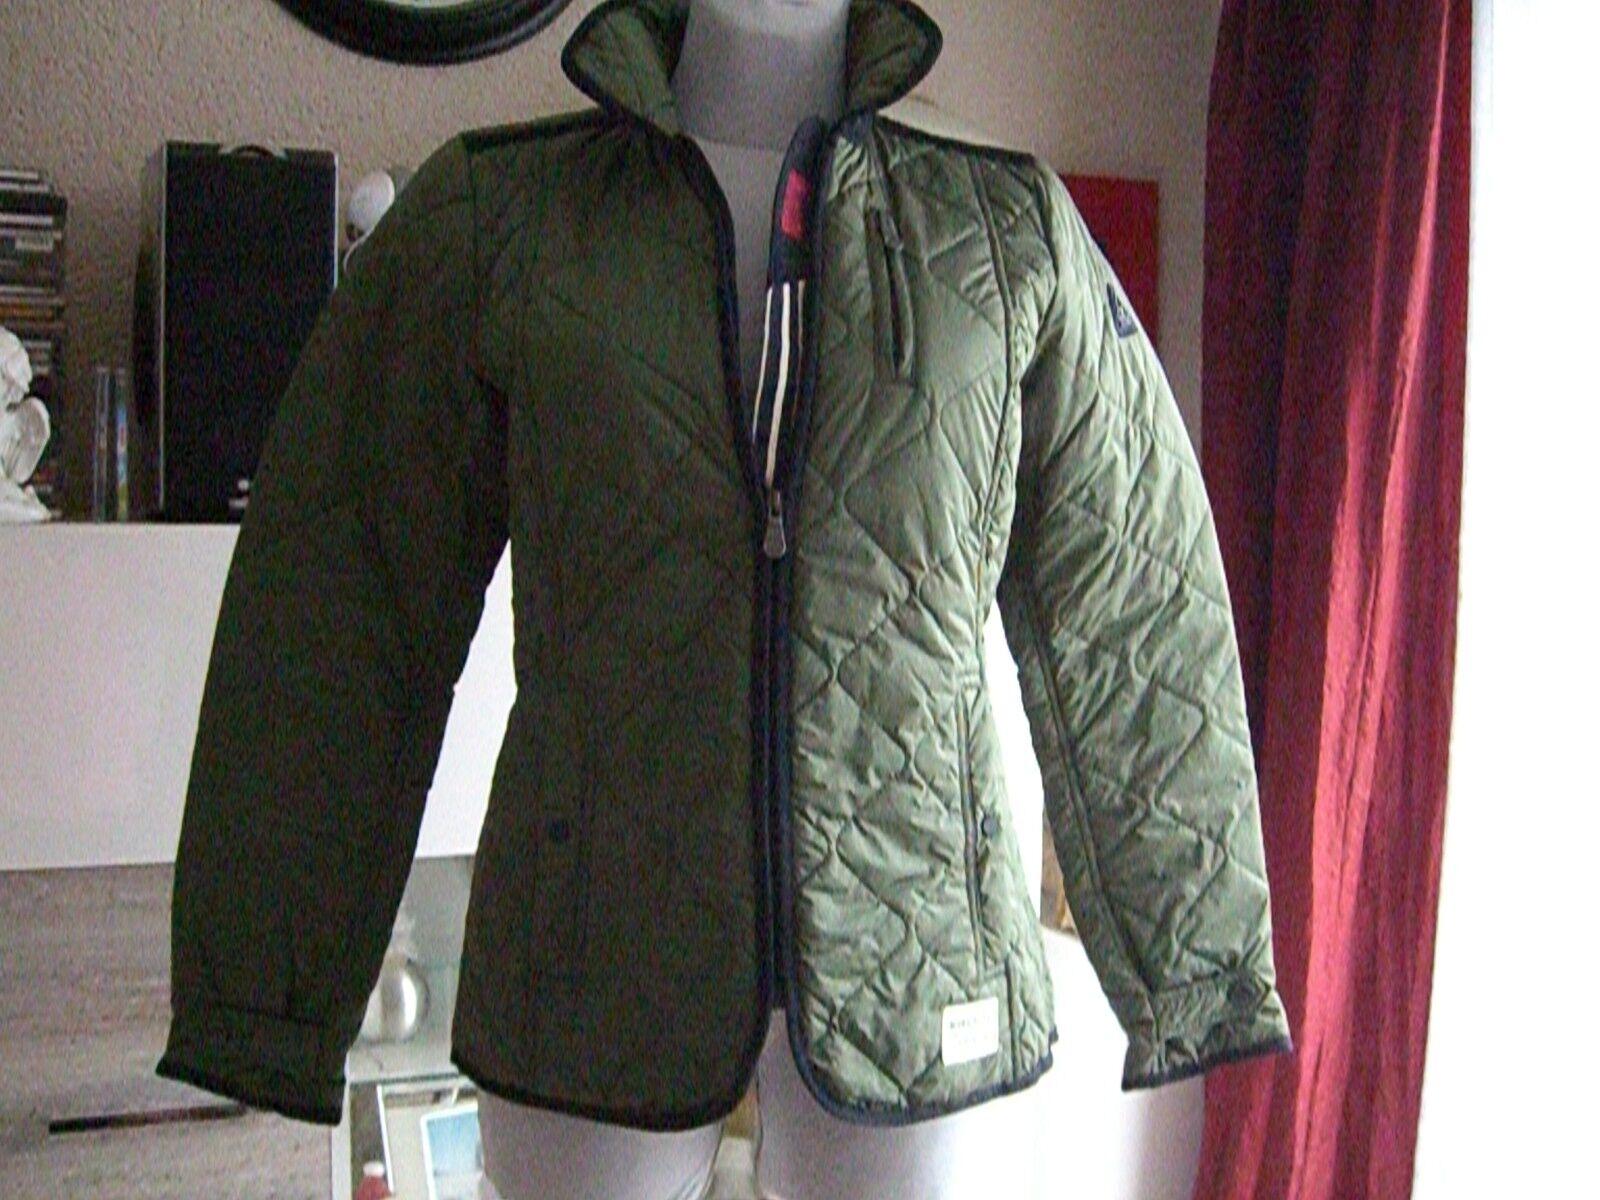 competitive price 1a884 984e5 GAASTRA Damen Jacke Steppjacke M (38) Kapuze 1014 grün oliv ...